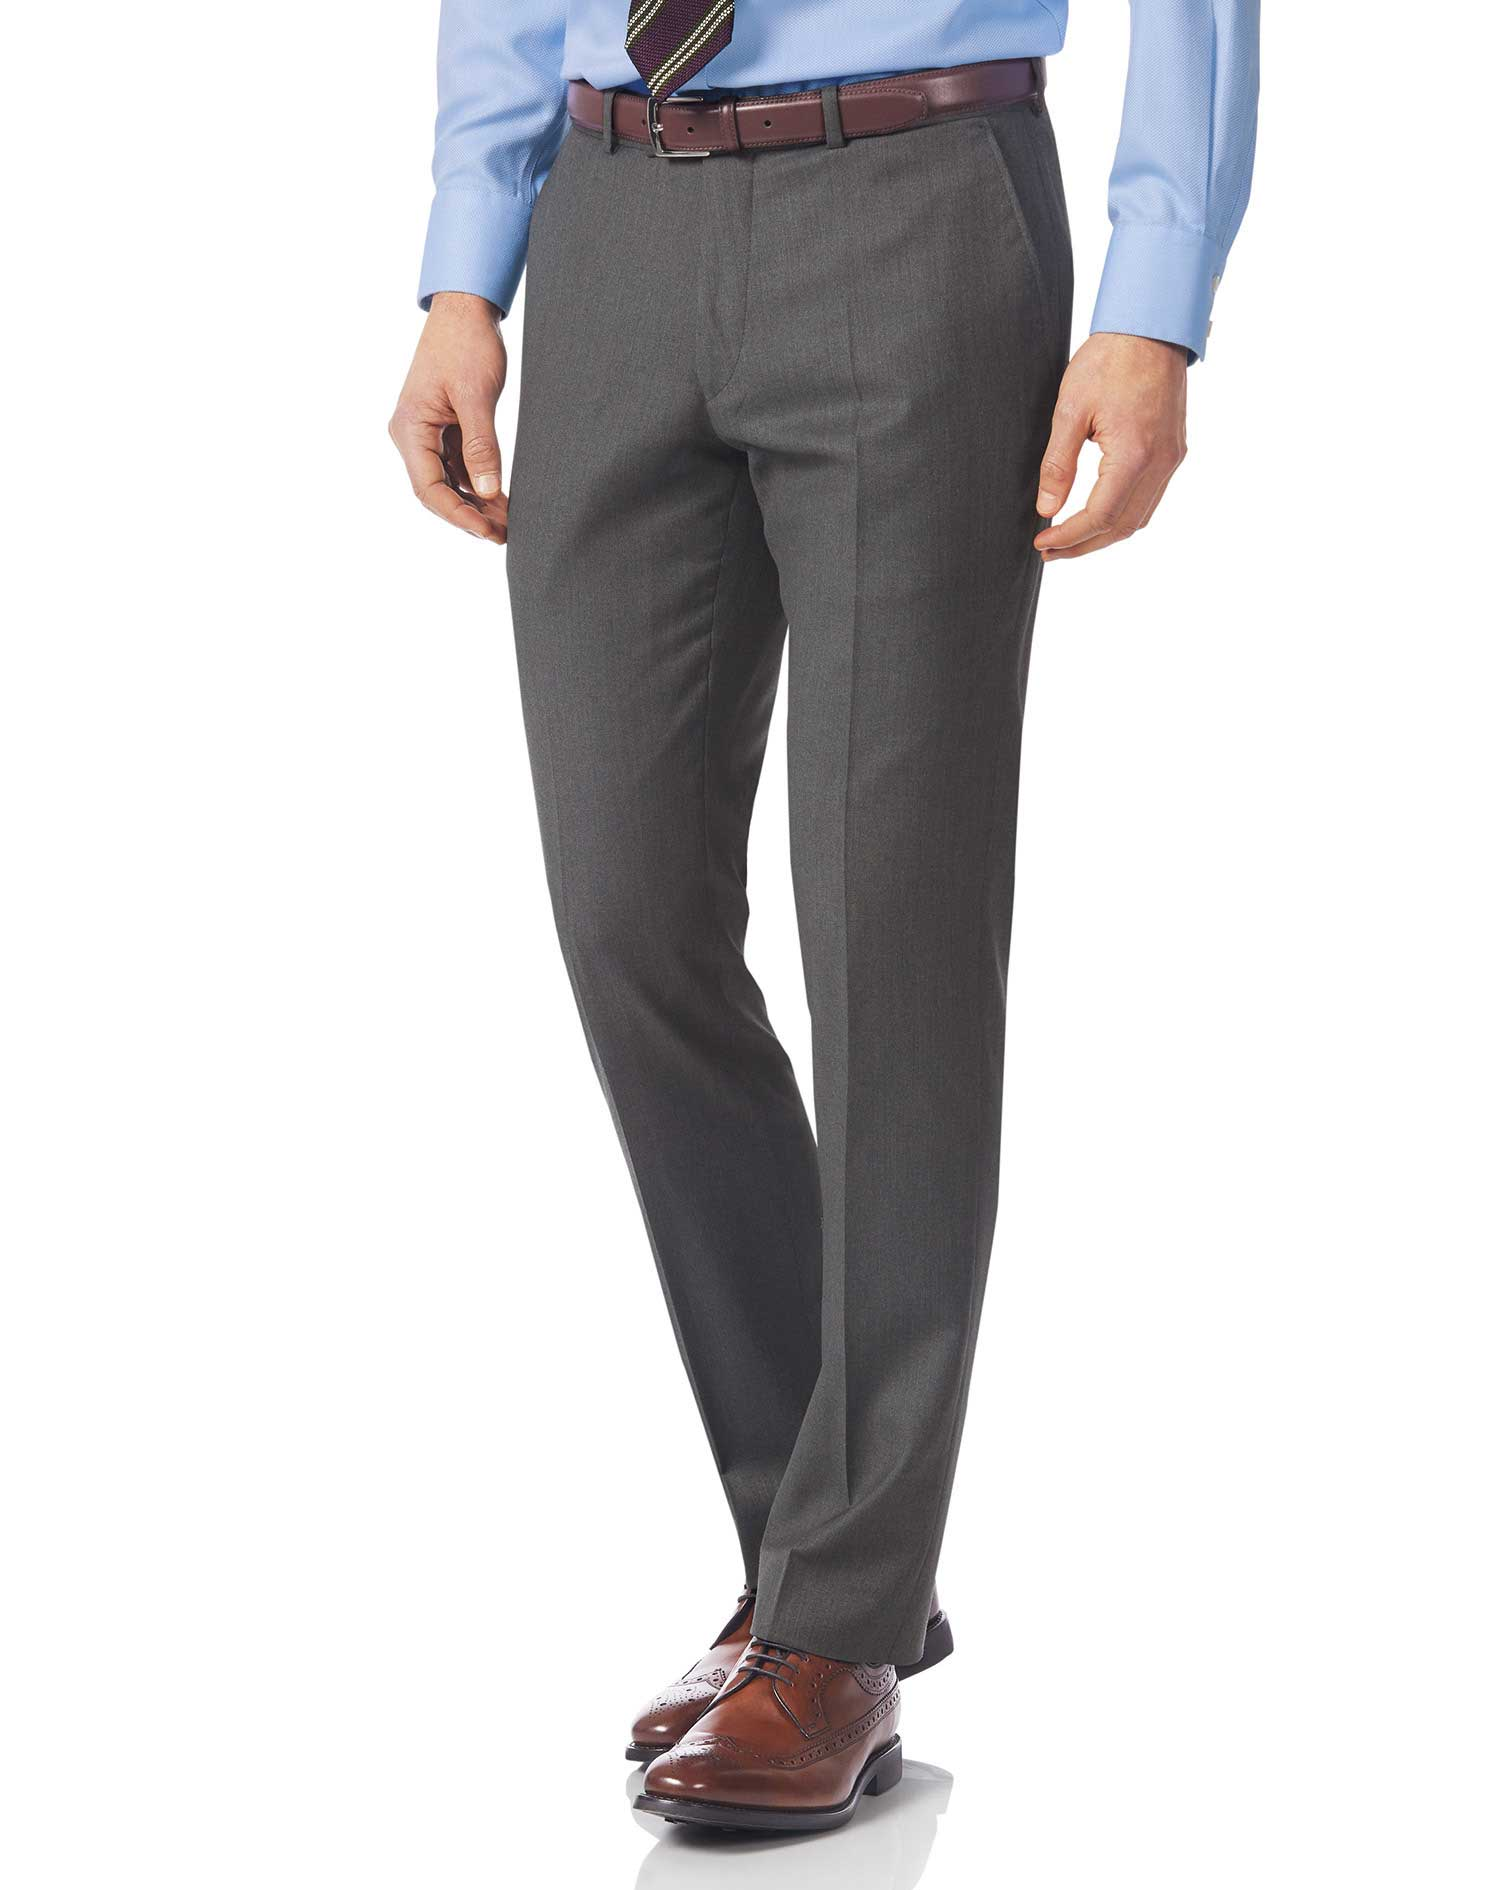 Grey Slim Fit Italian Twill Luxury Suit Trousers Size W36 L32 by Charles Tyrwhitt